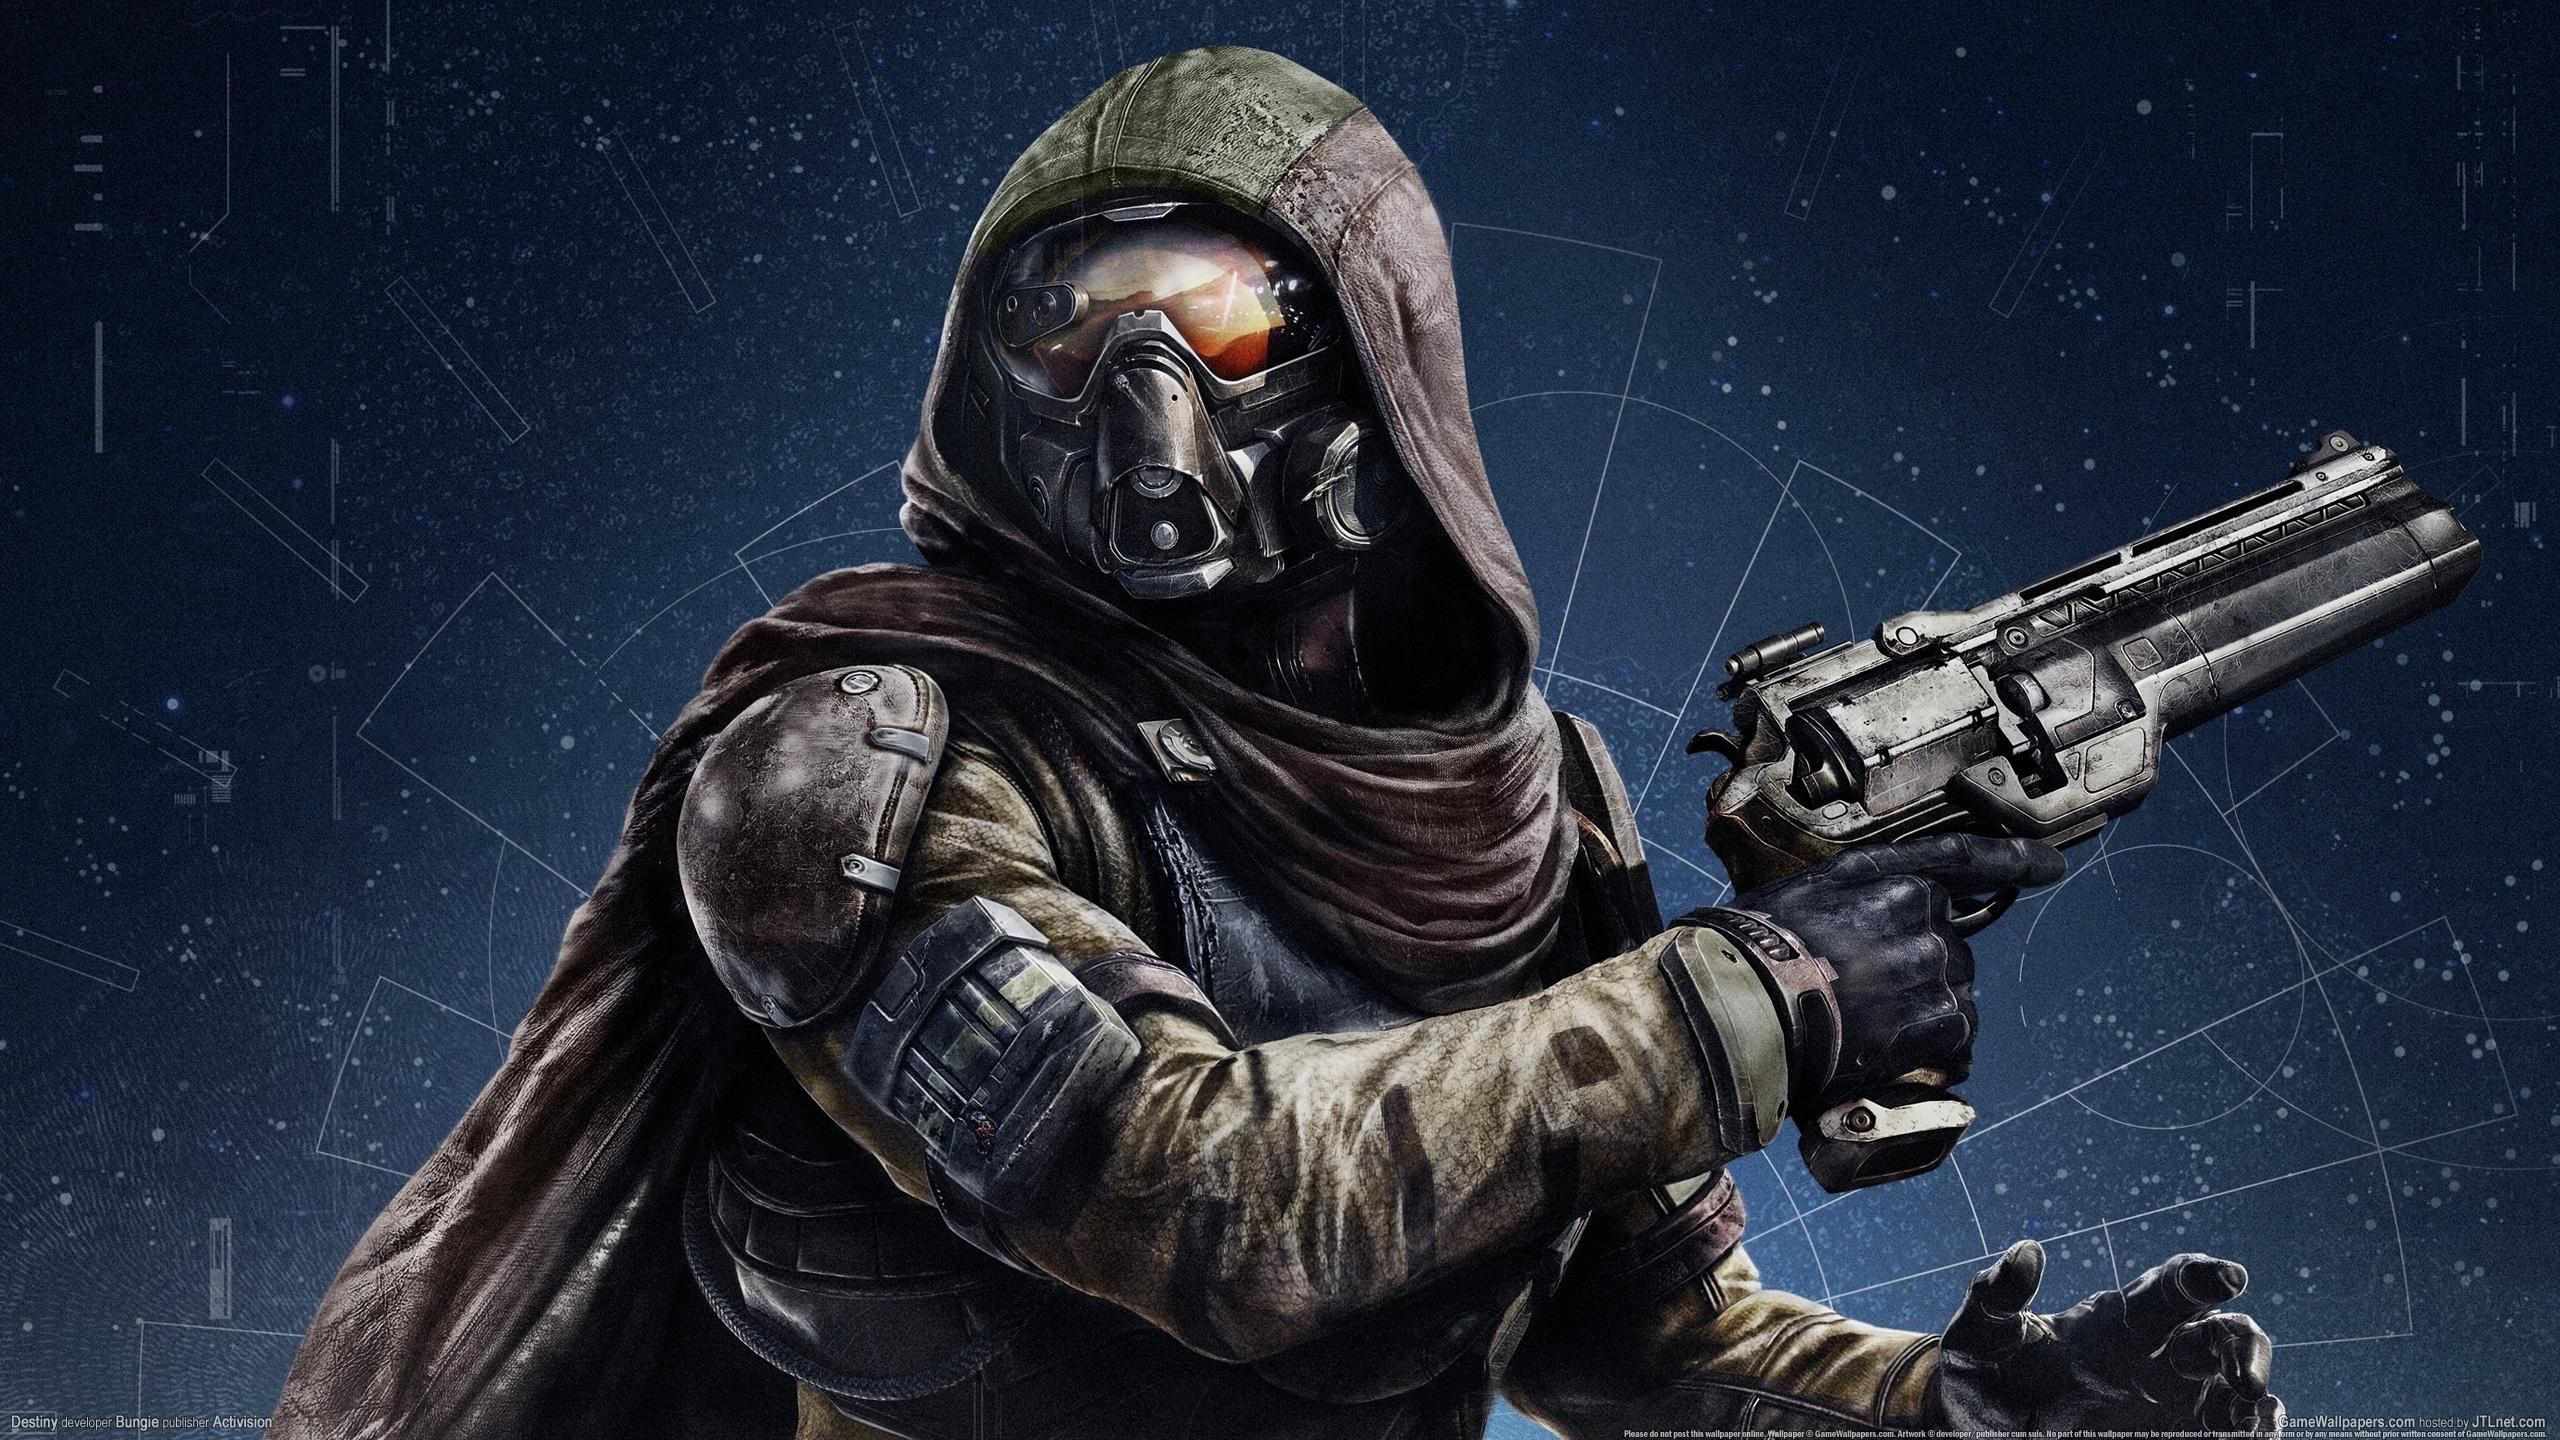 Revolver Hood headgear mask sci fi weapon gun wallpaper background 2560x1440